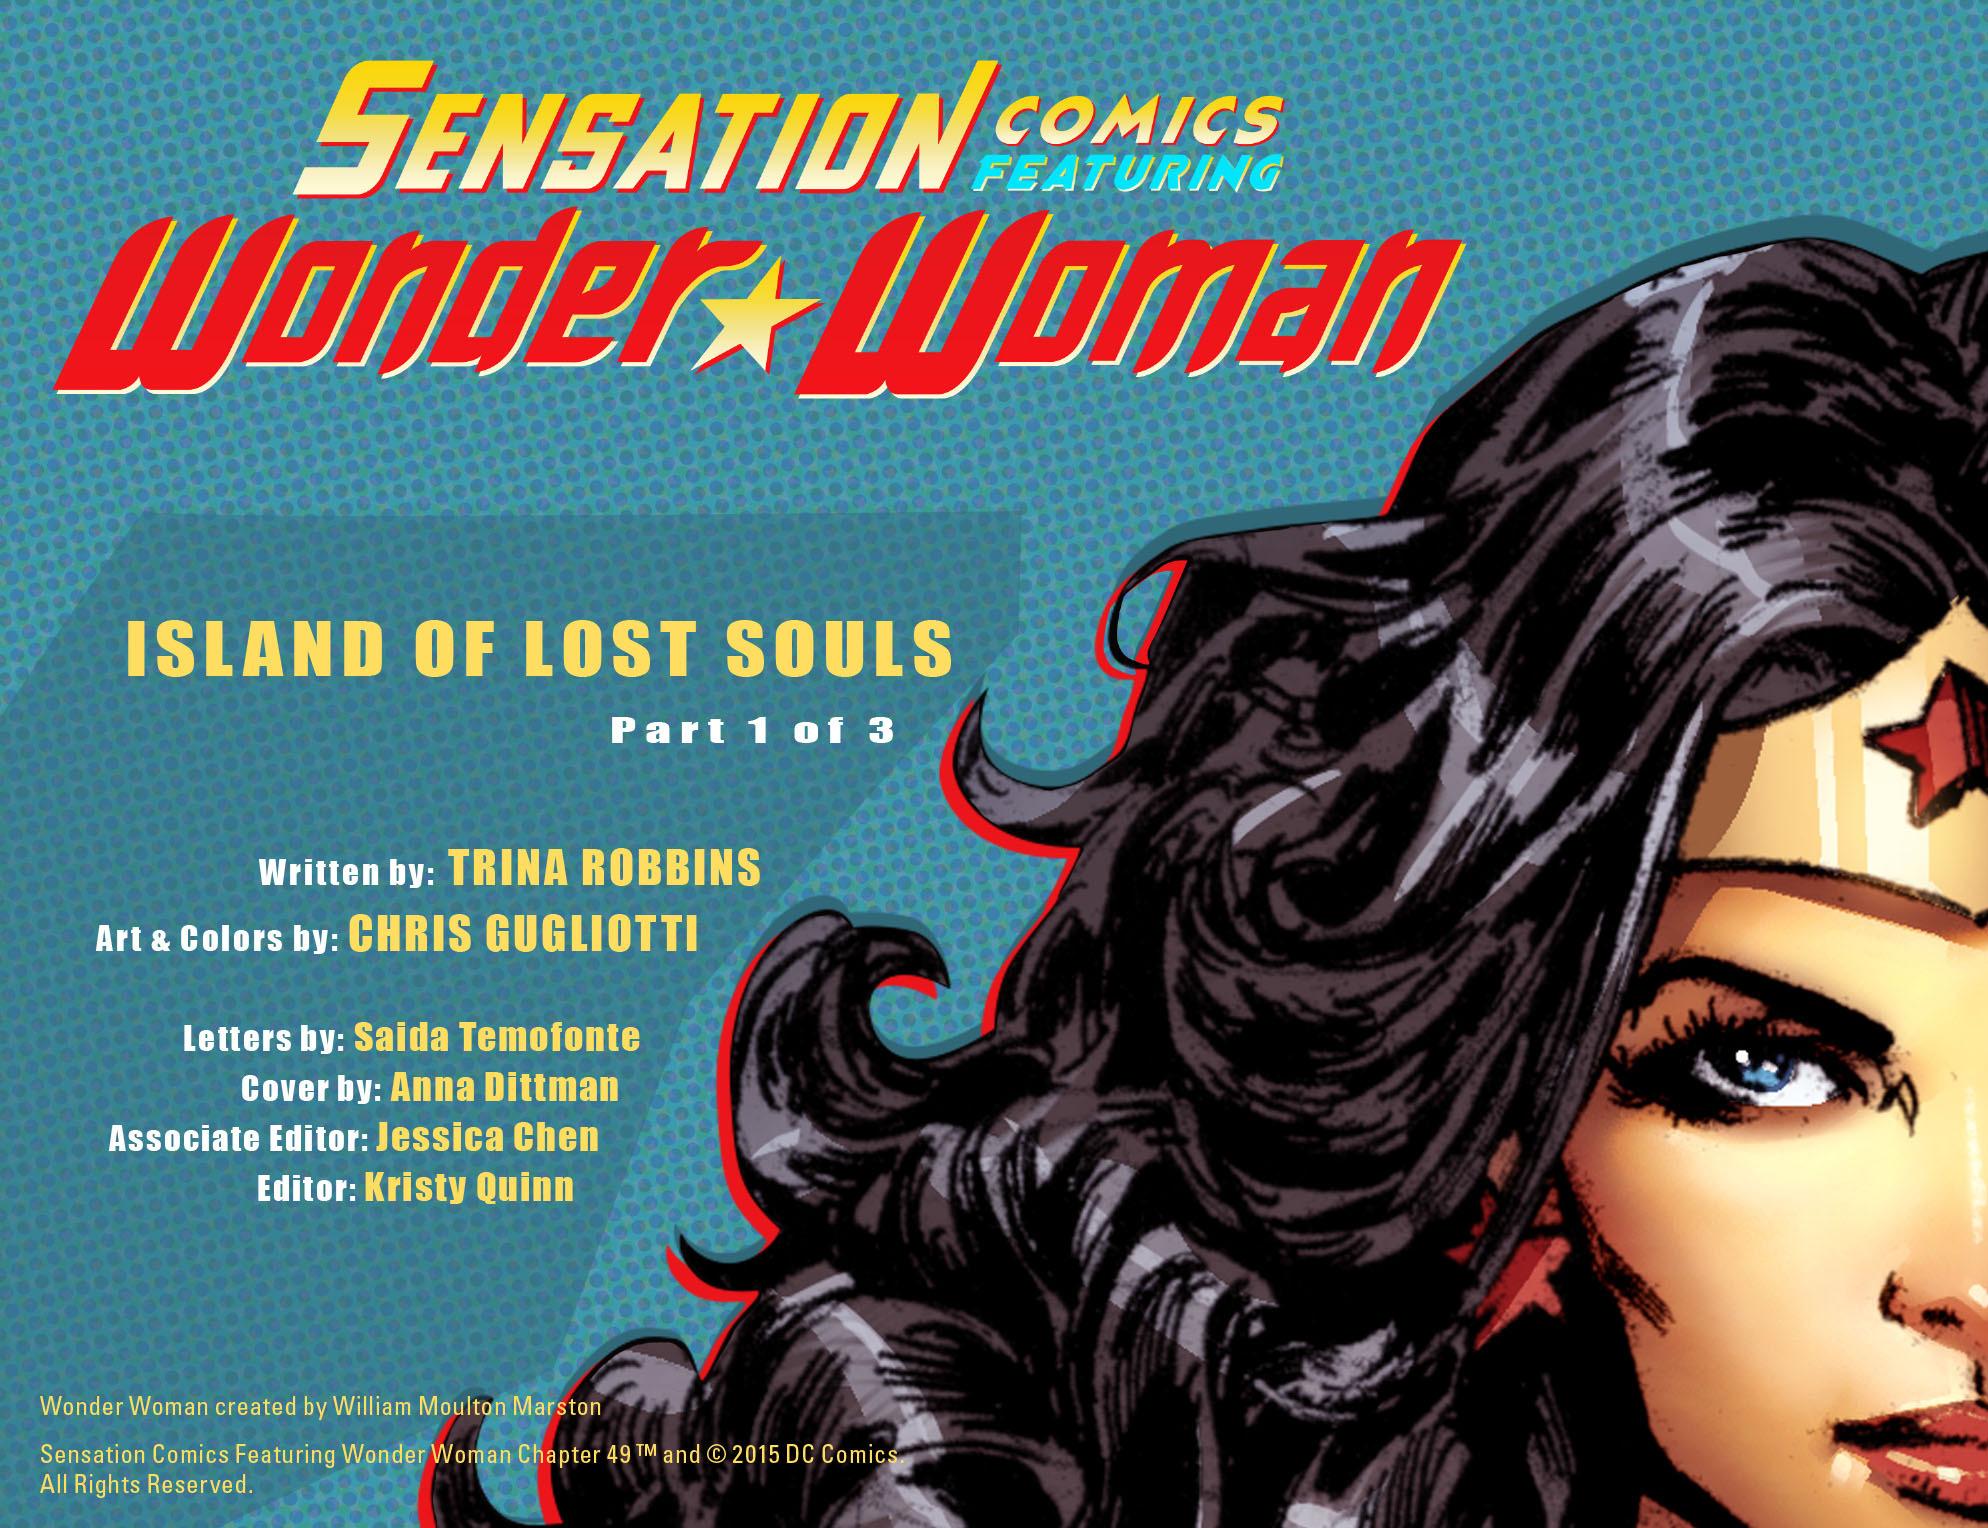 Read online Sensation Comics Featuring Wonder Woman comic -  Issue #49 - 3